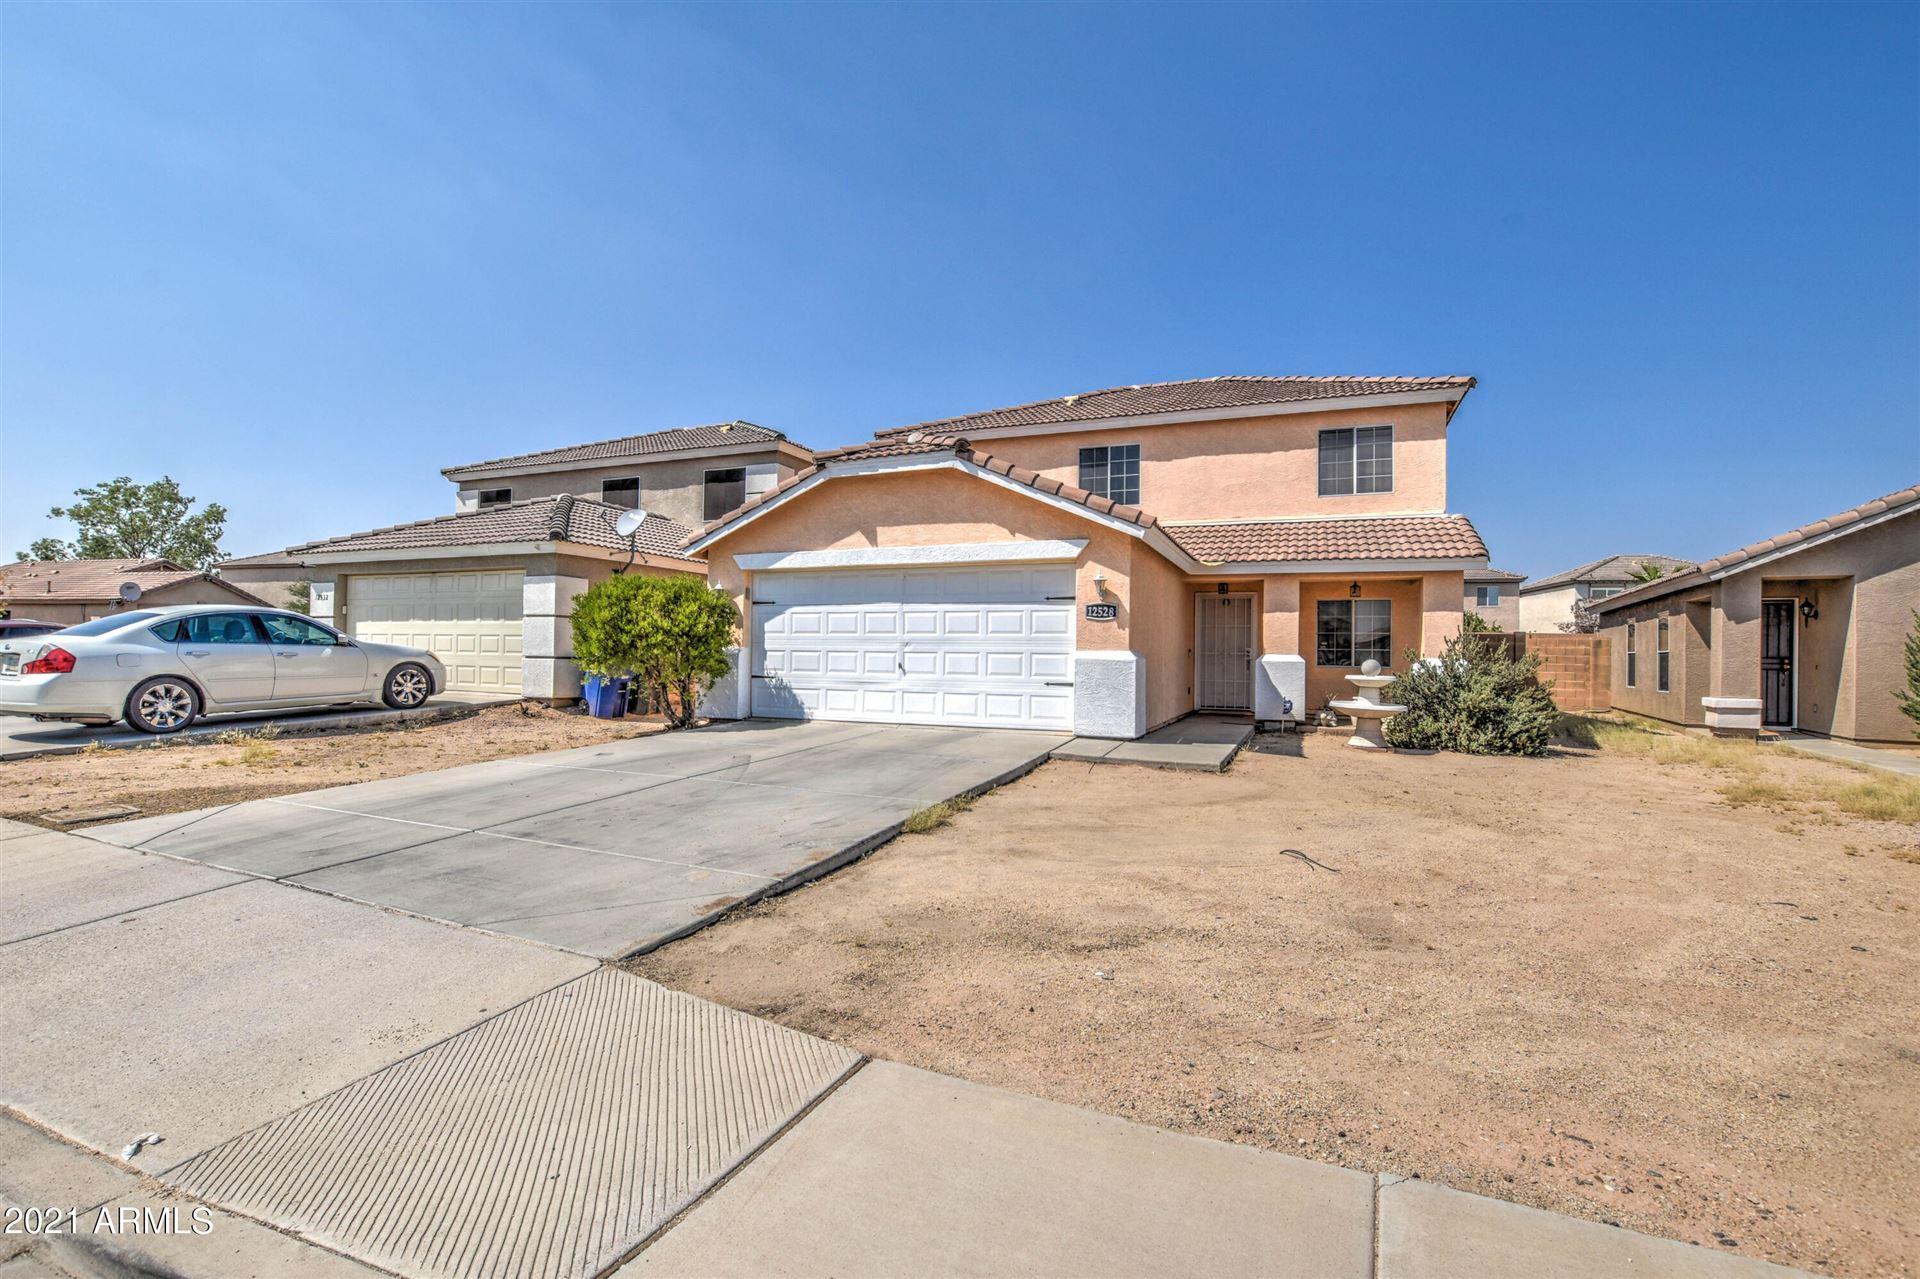 Photo of 12528 W MYER Lane, El Mirage, AZ 85335 (MLS # 6294481)